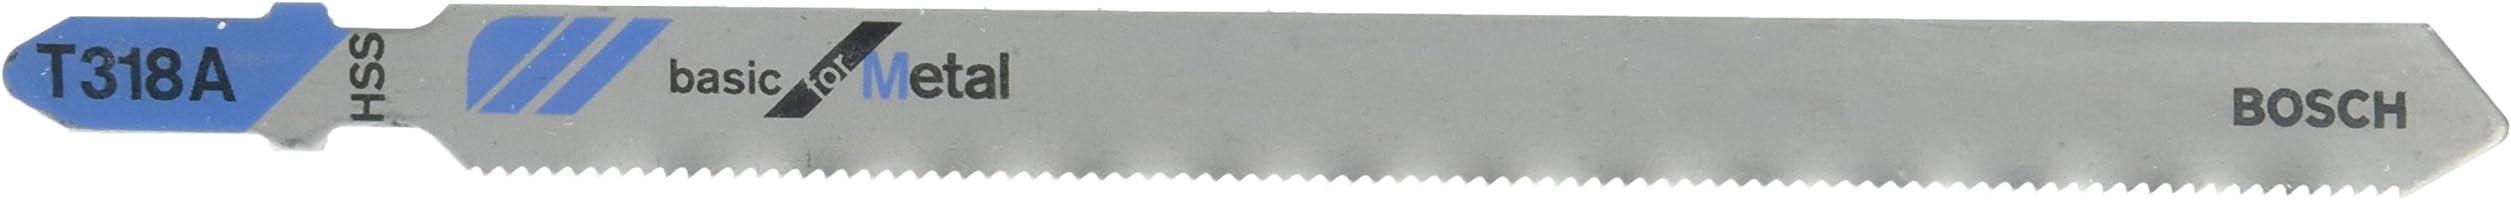 Bosch T318A Jigsaw Blades for Metal-5pc